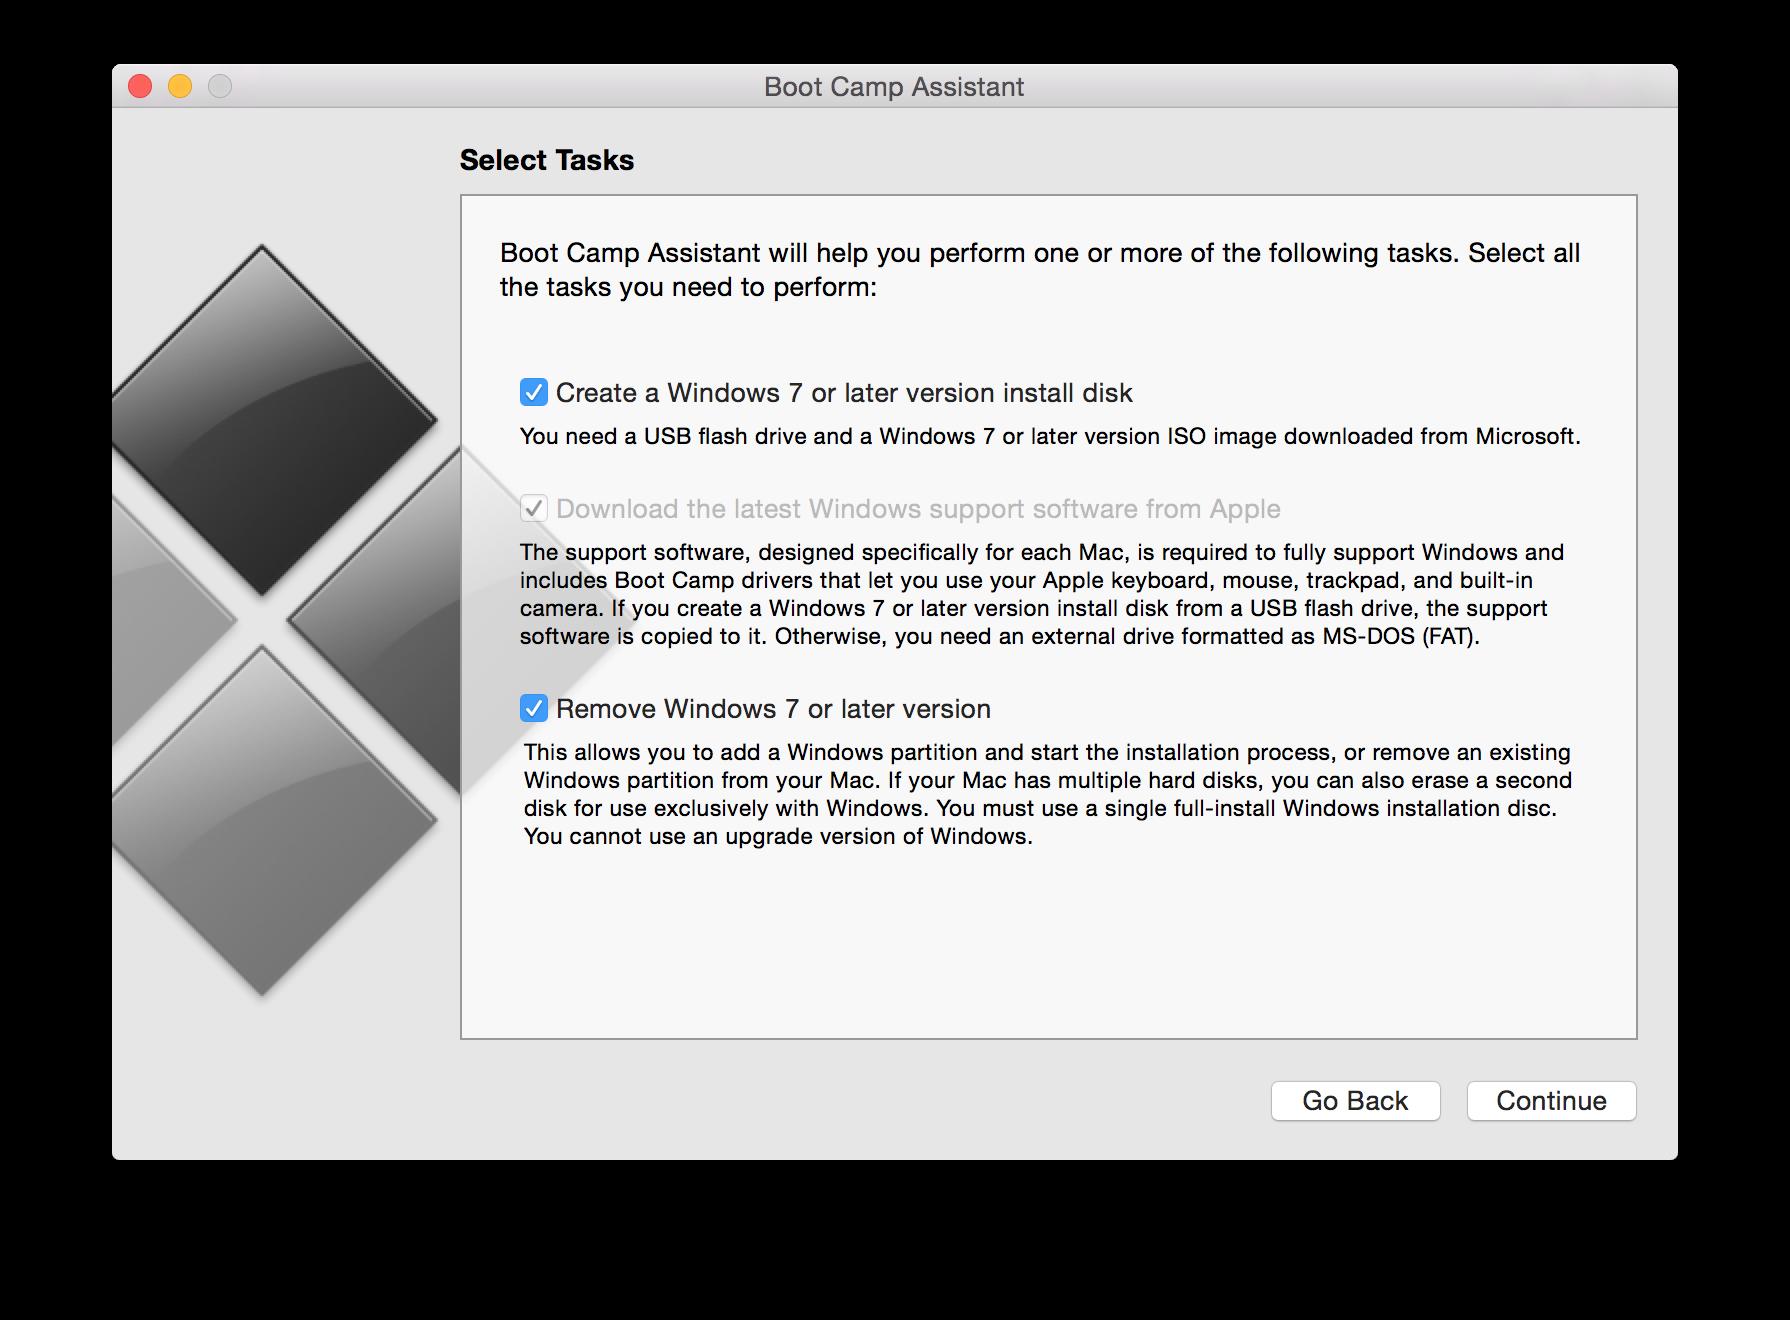 gta 5 is not working on windows 10